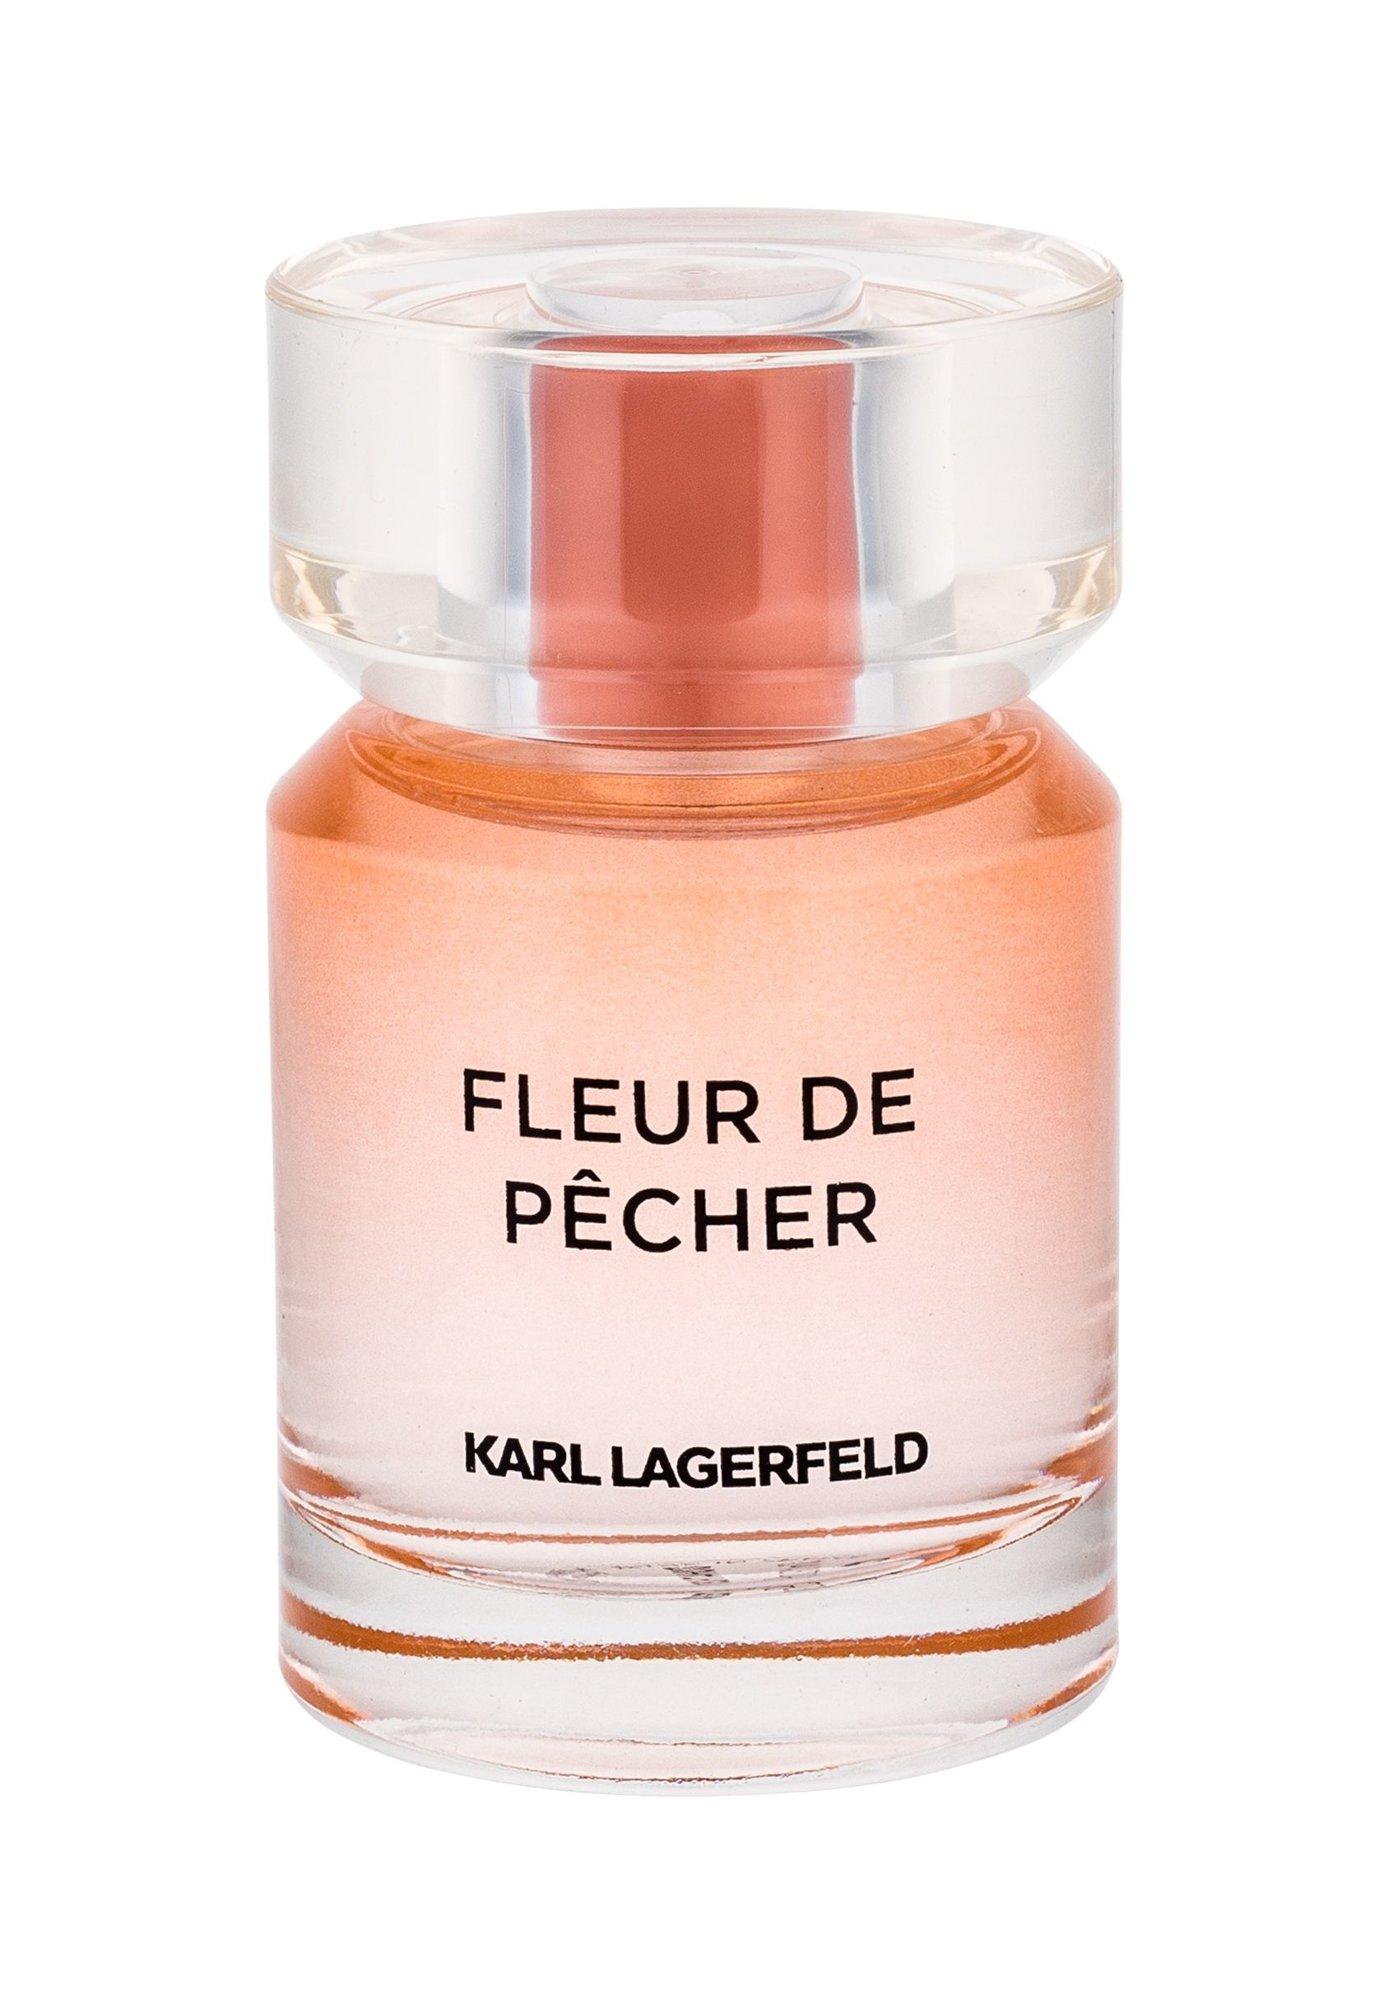 Karl Lagerfeld Les Parfums Matieres Fleur de Pecher EDP 50ml